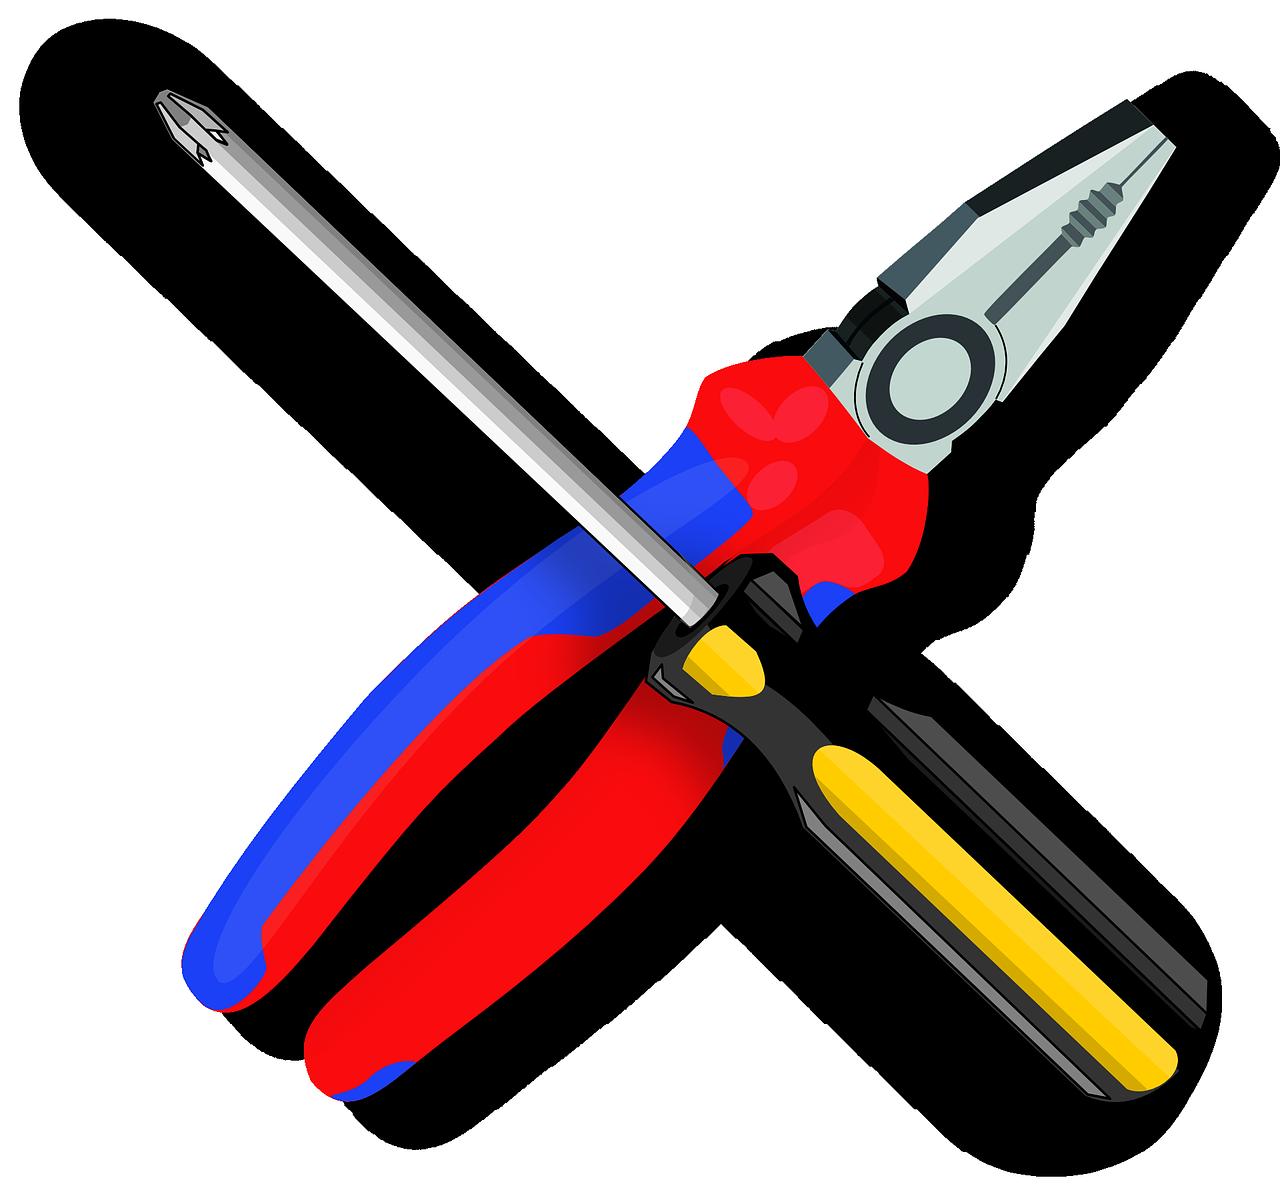 tool, pliers, screwdriver